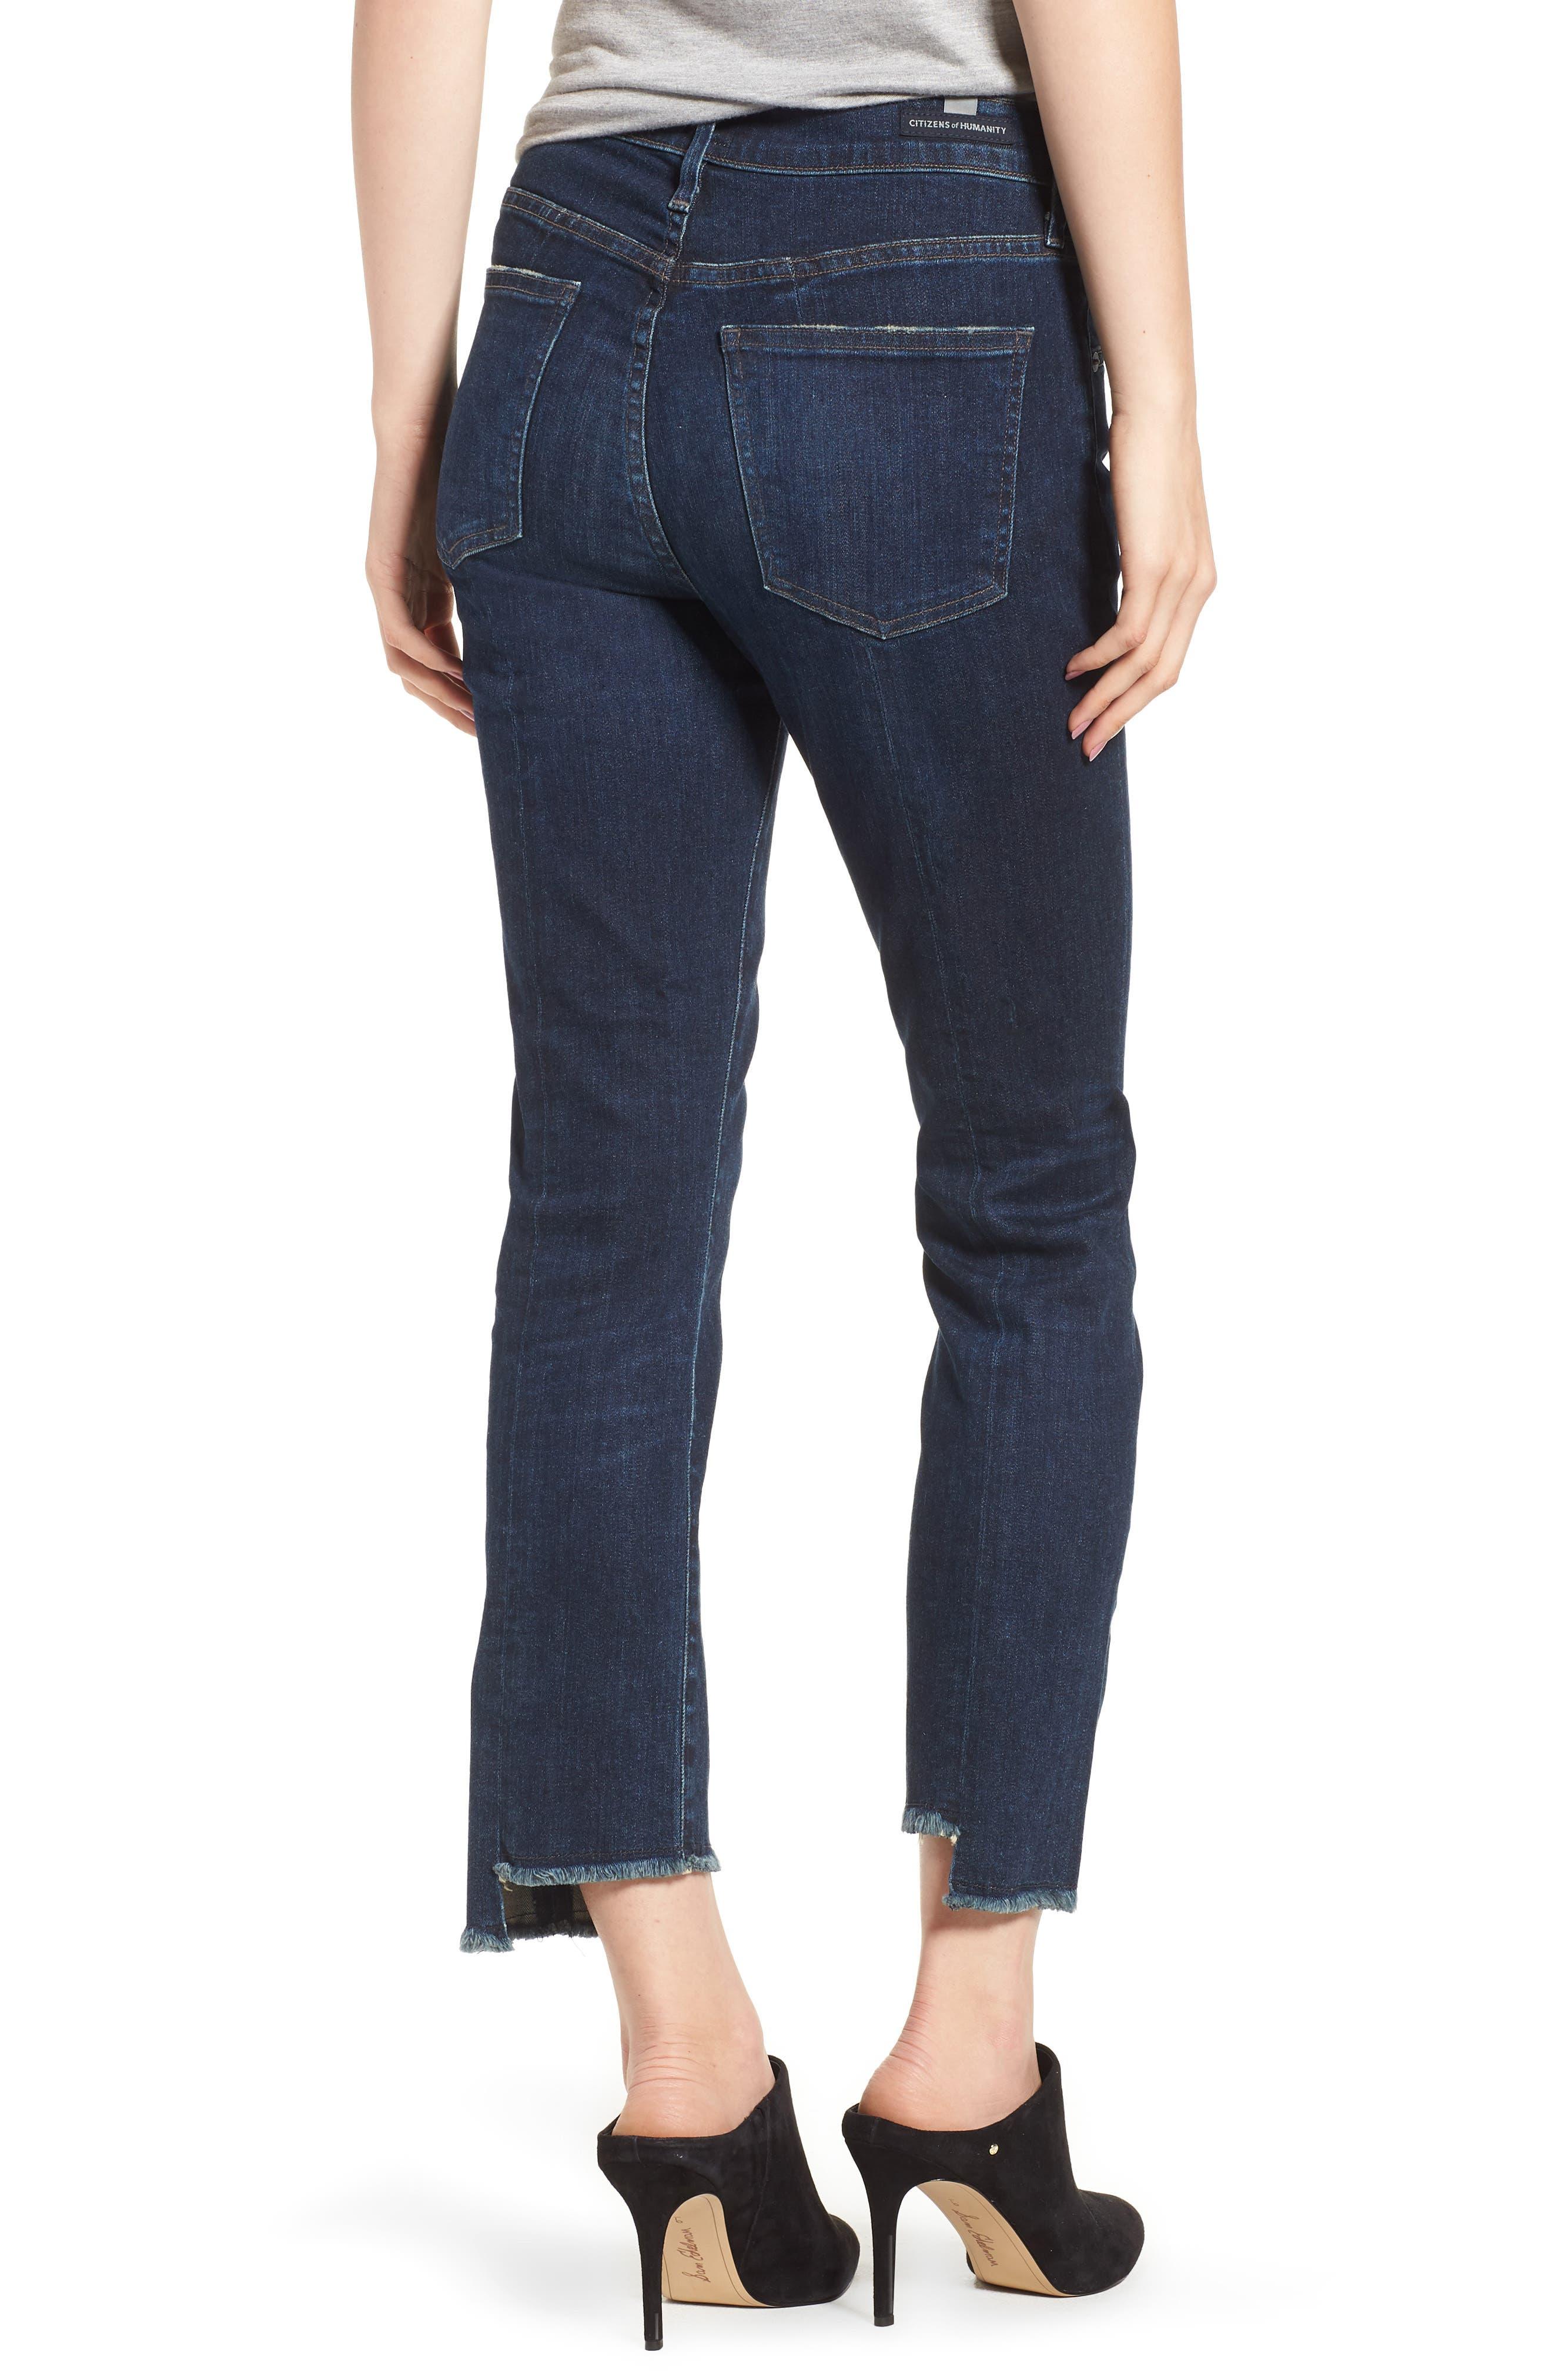 Amari Ankle Skinny Jeans,                             Alternate thumbnail 2, color,                             401